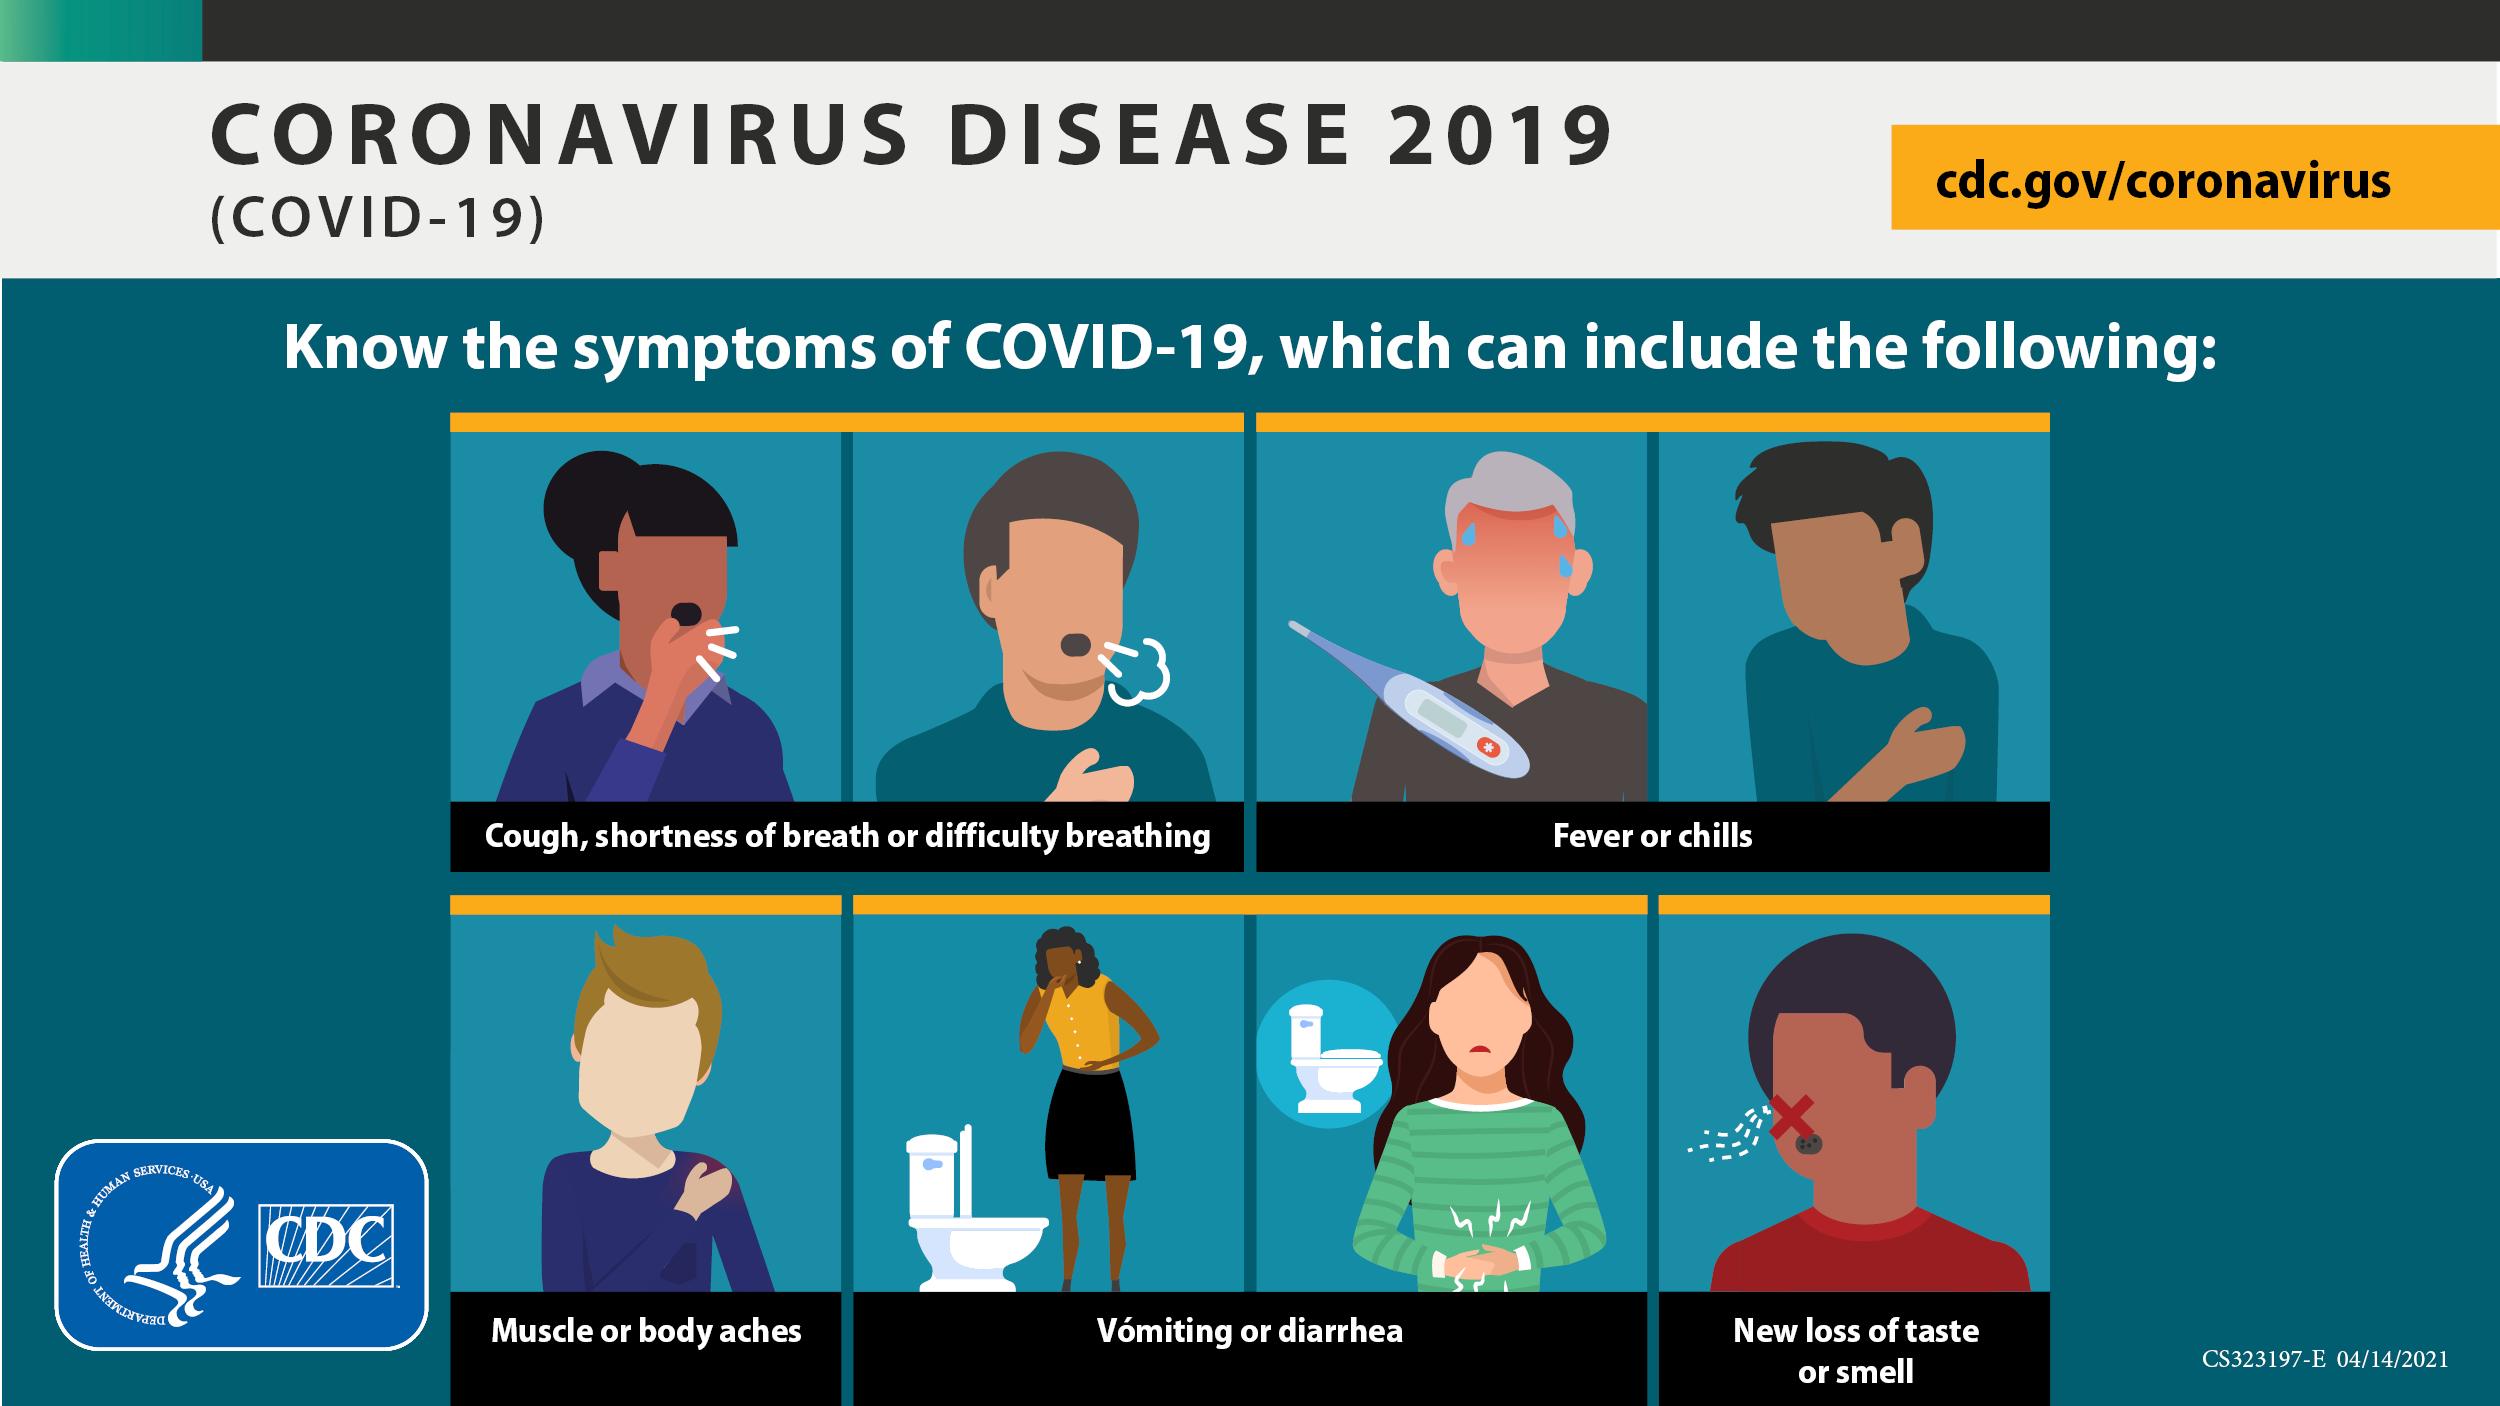 "<a href=""/coronavirus/2019-ncov/images/community/323197-e-h_covid-19_symptoms.png"">영어[PNG -220KB]</a> <a href=""/coronavirus/2019-ncov/images/community/toolkits/323197-e-h_covid-19_symptoms7.png"">Español[PNG -219KB]</a>"